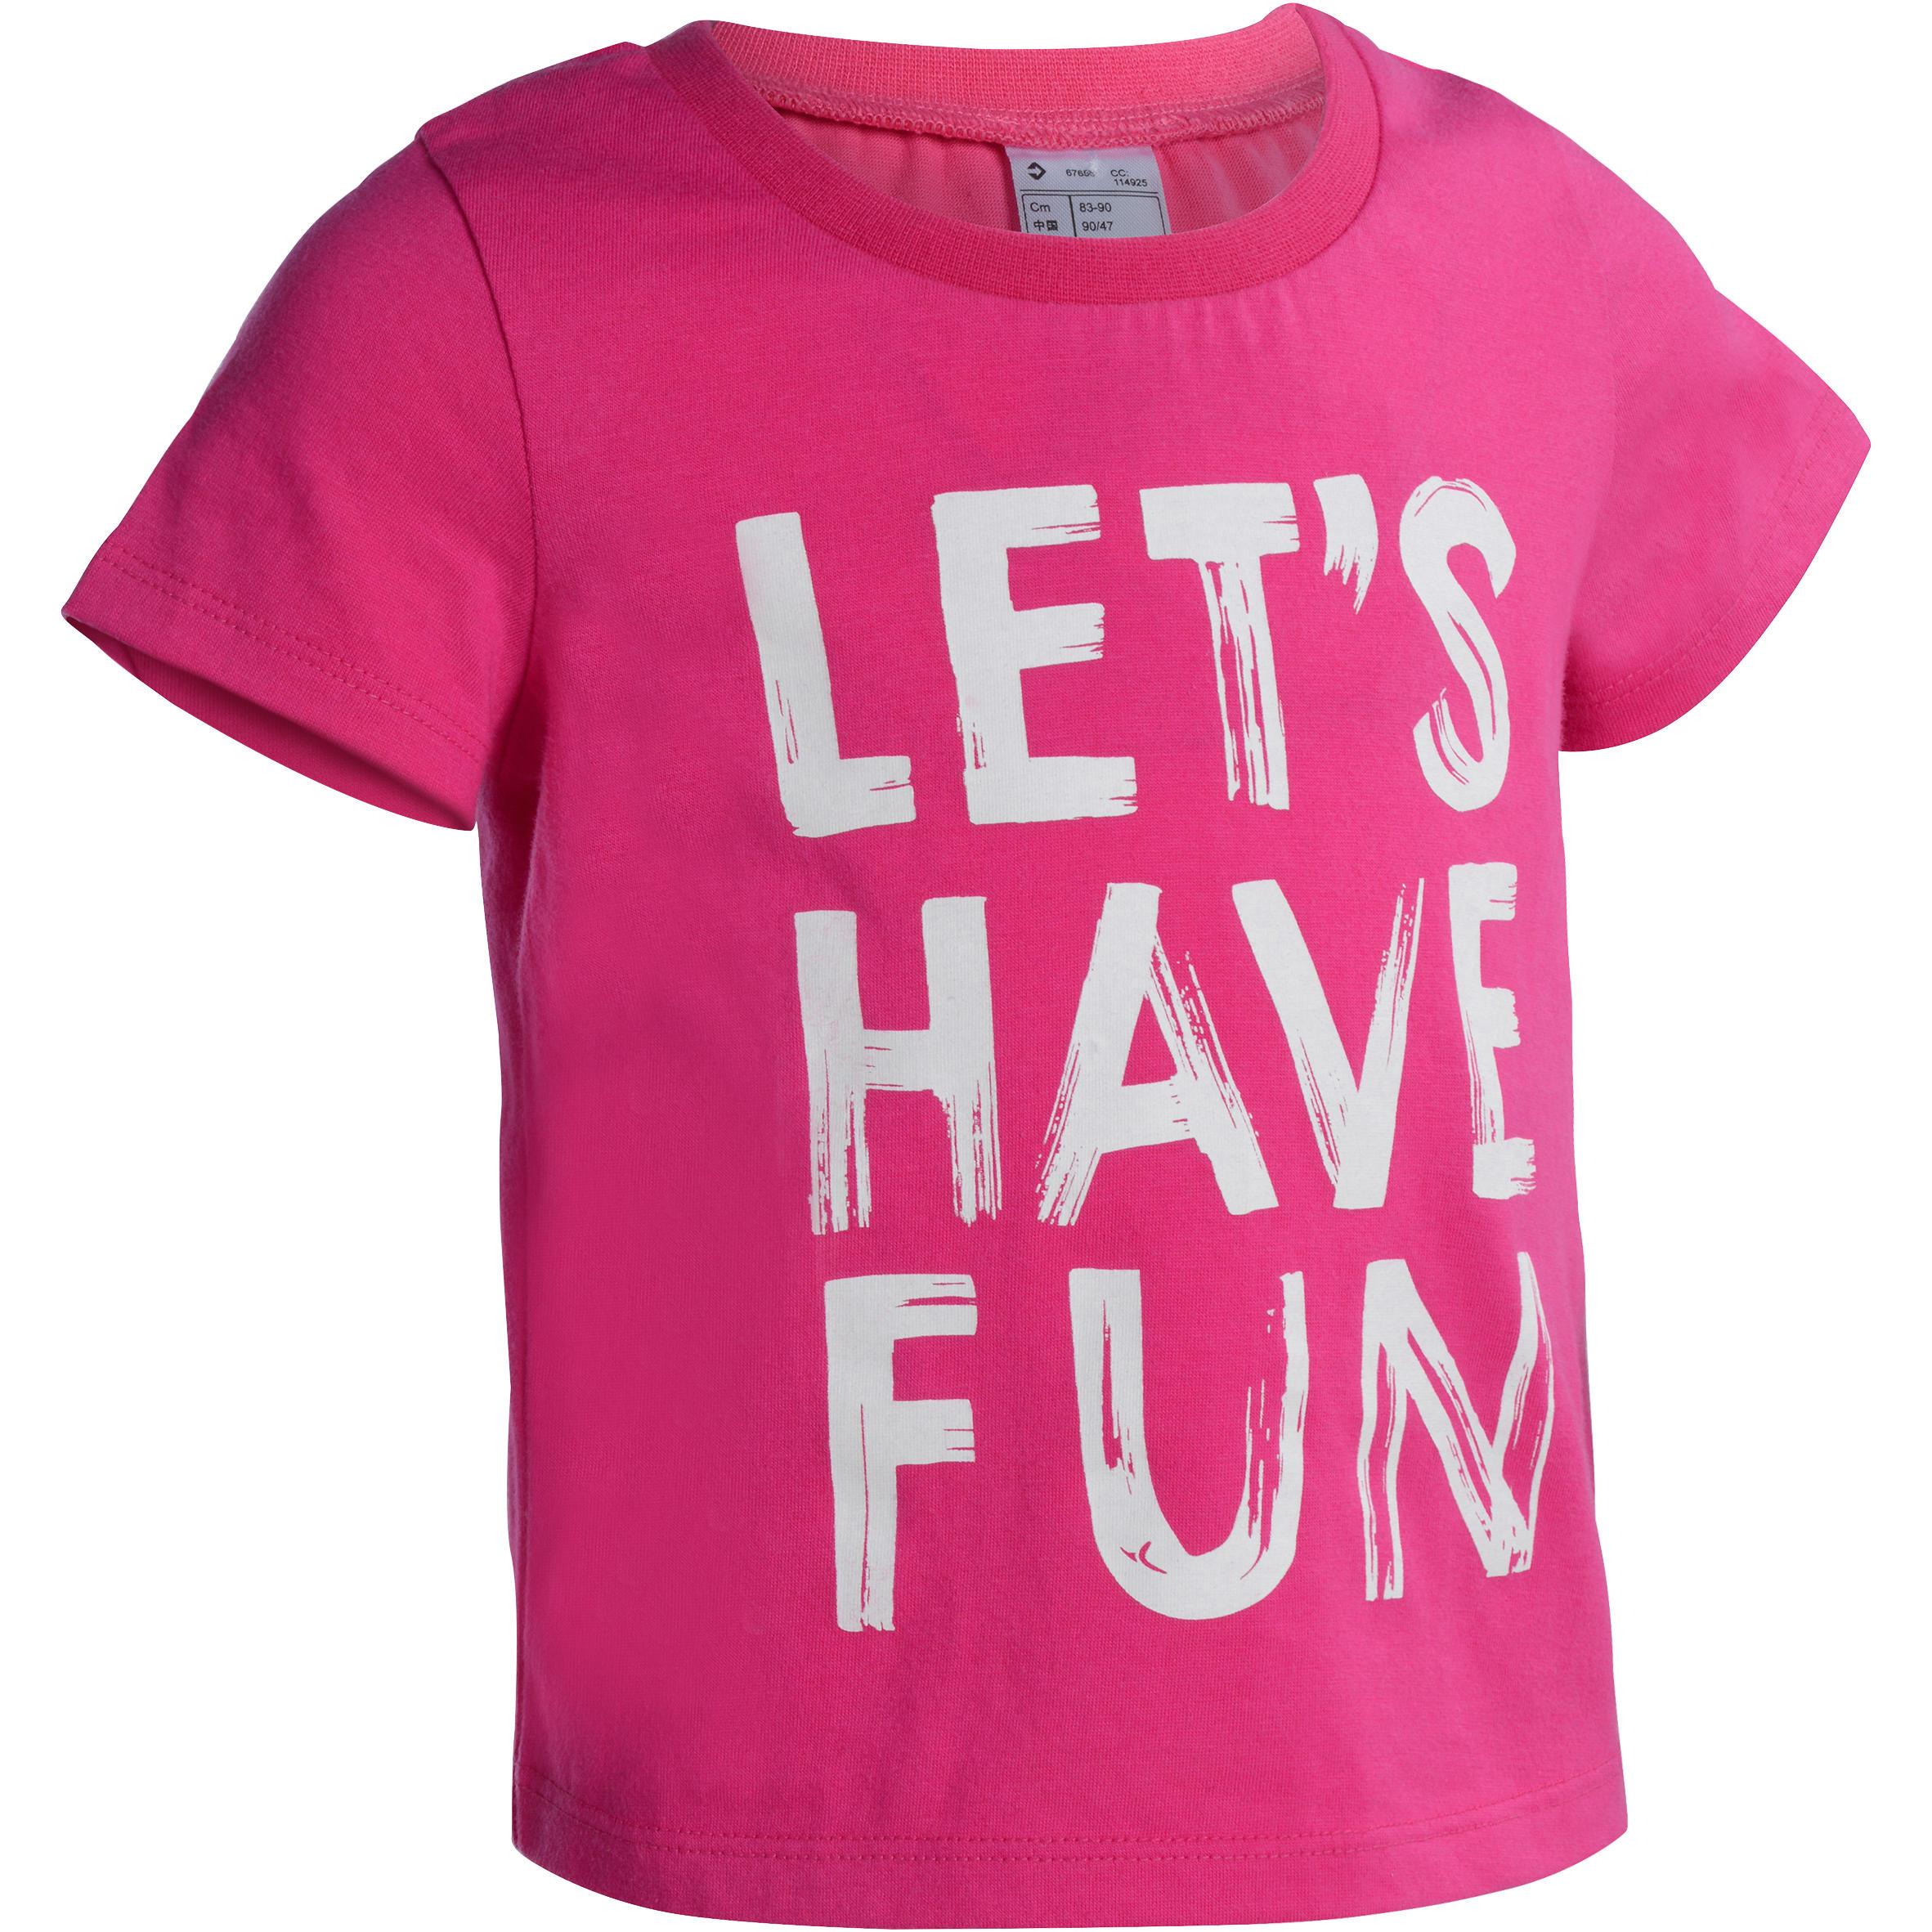 Camiseta de manga corta estampada gimnasia infantil rosa